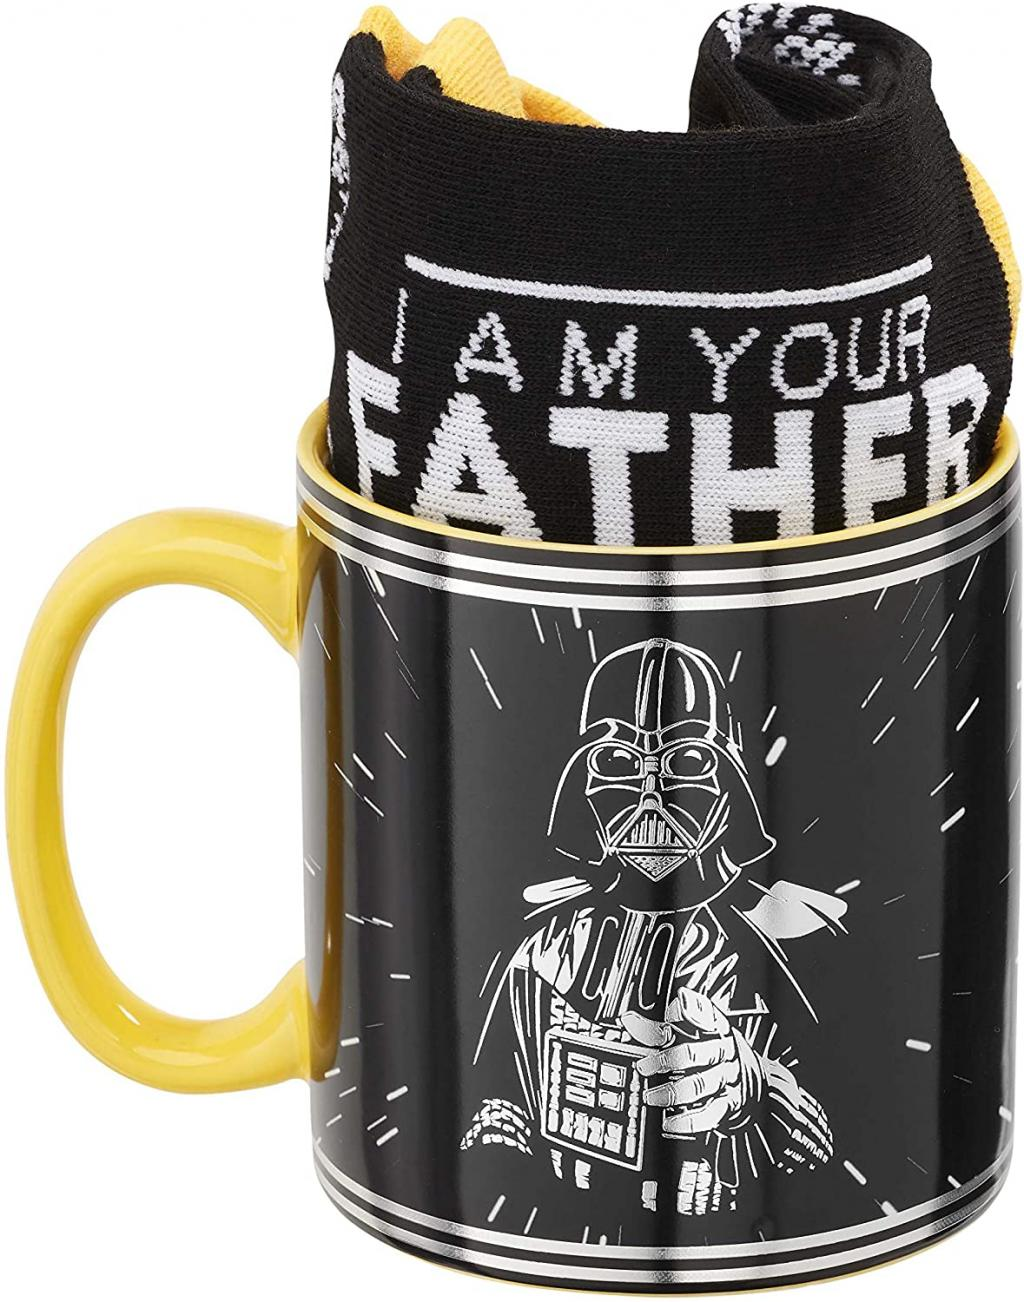 STAR WARS - Coffret Mega Mug et Chausettes 'I am Your Father'_2